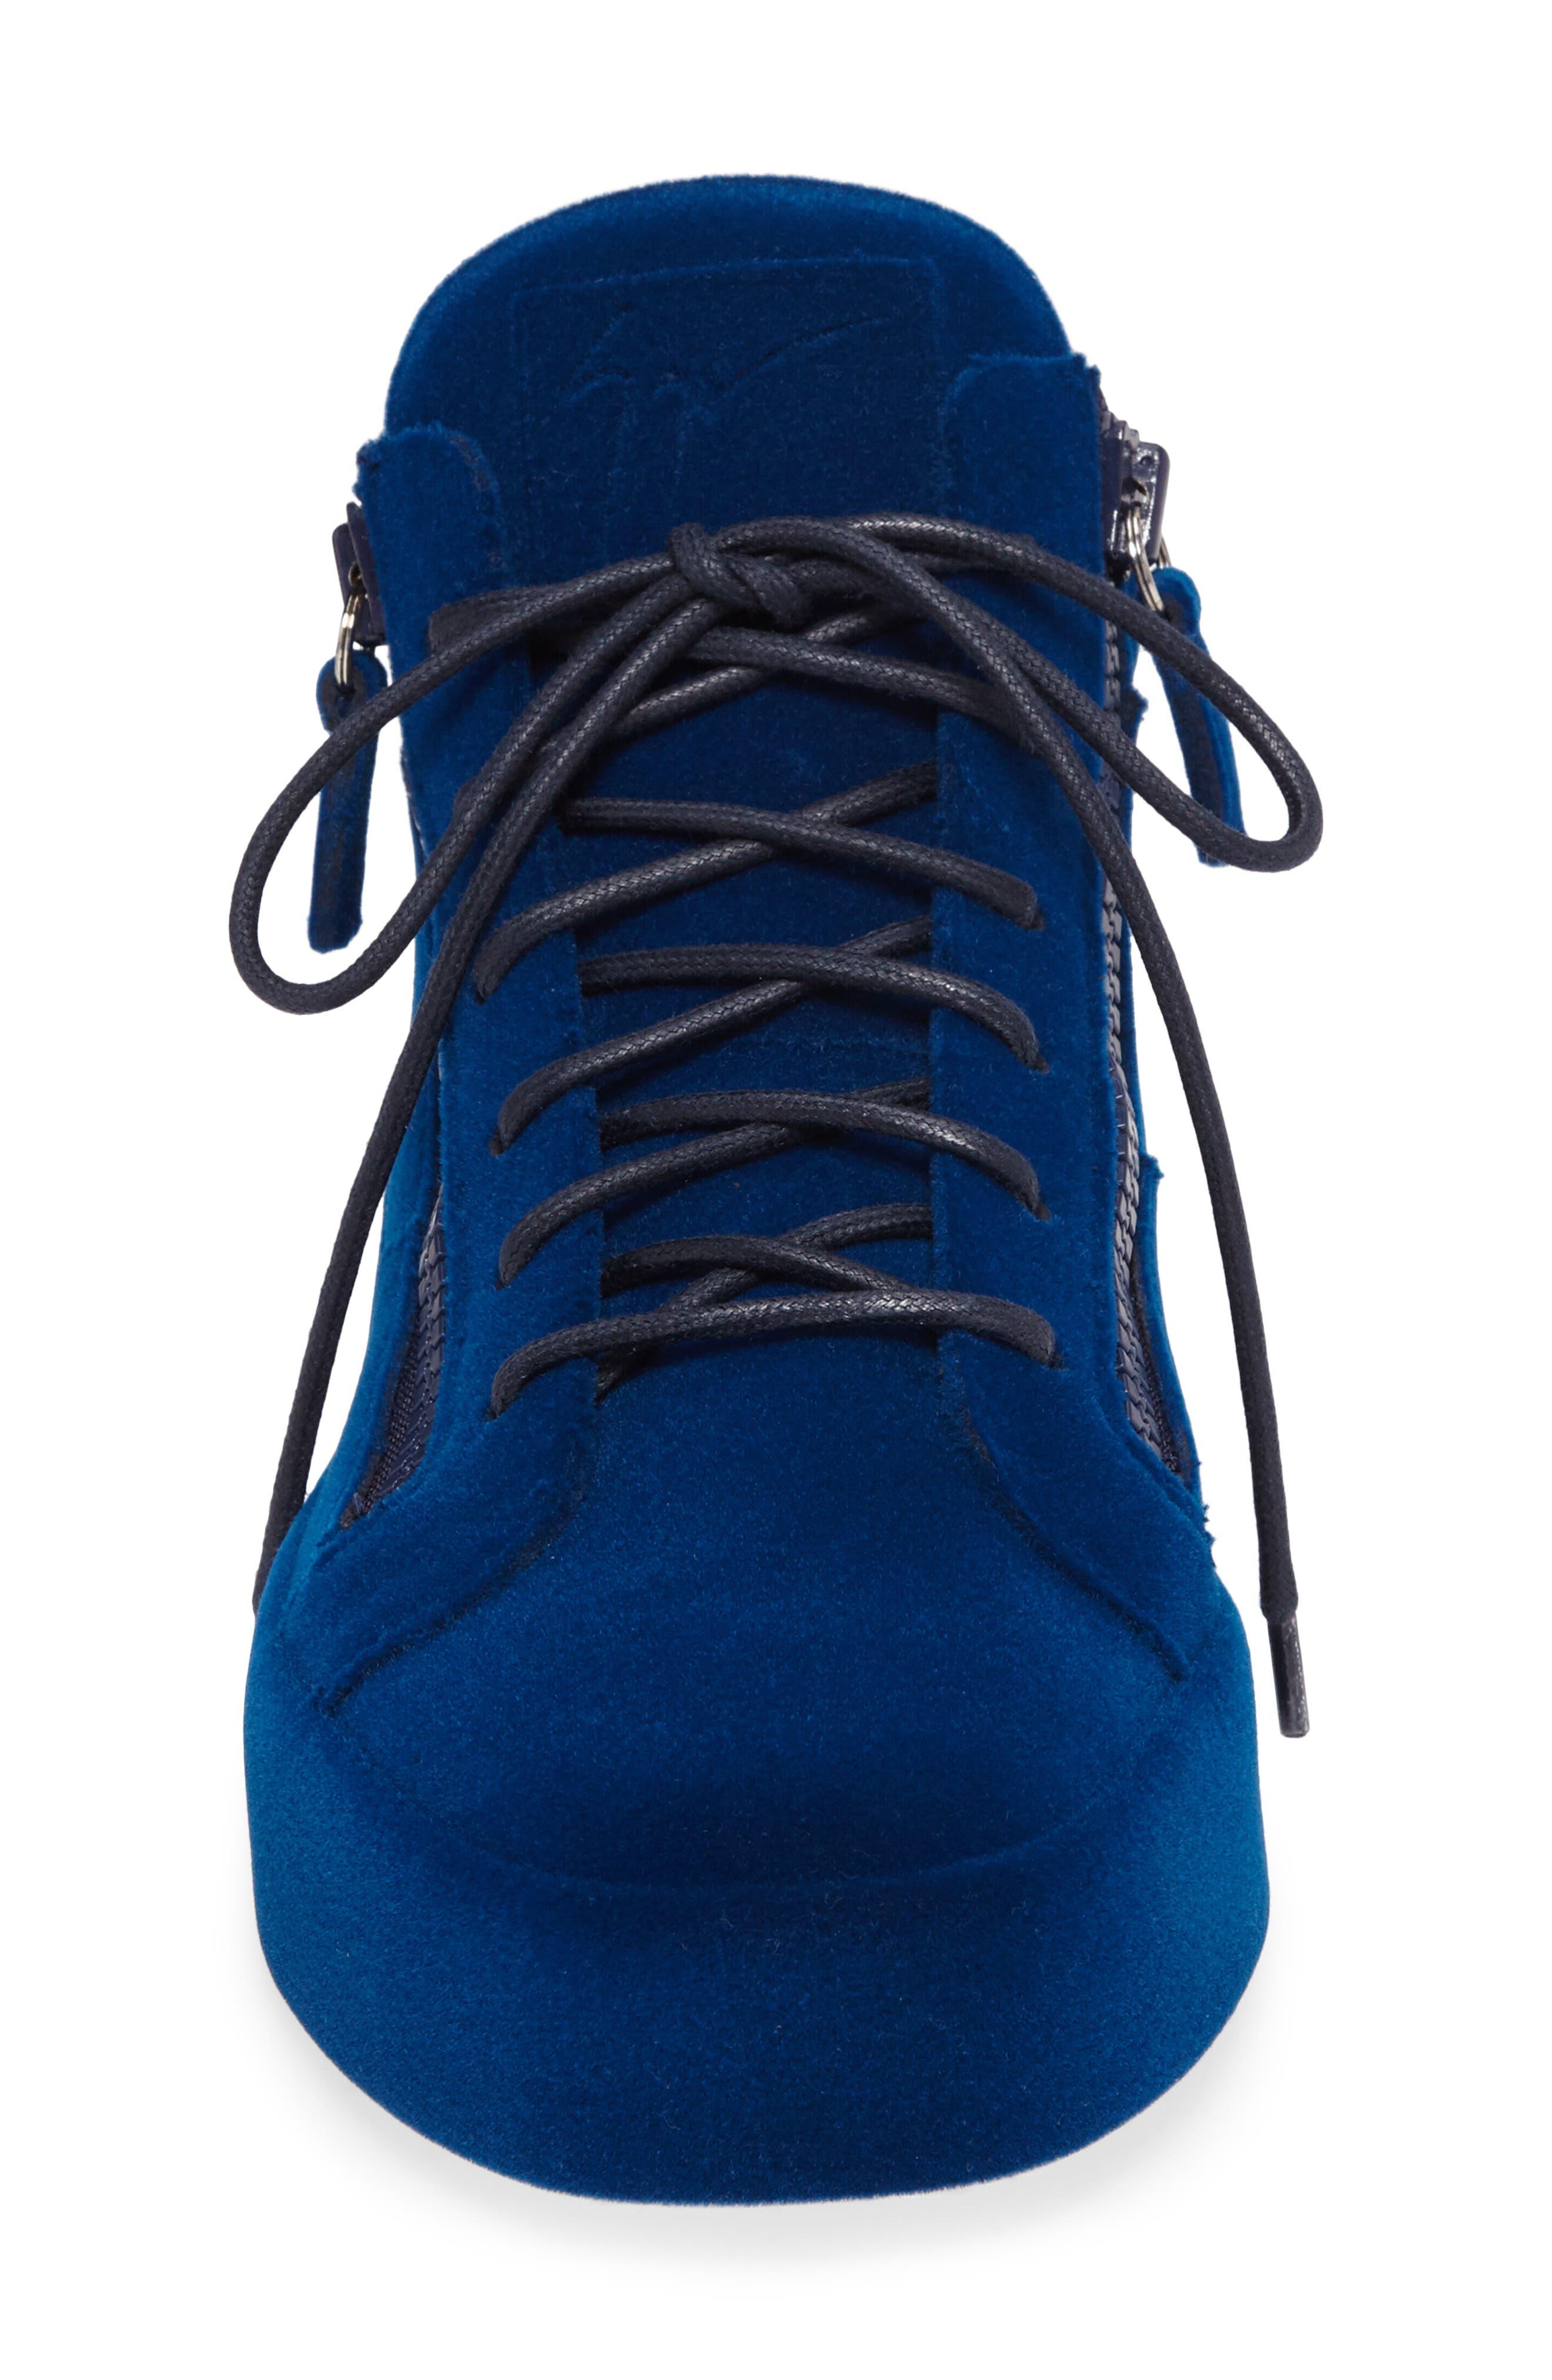 Mid Top Sneaker,                             Alternate thumbnail 4, color,                             469